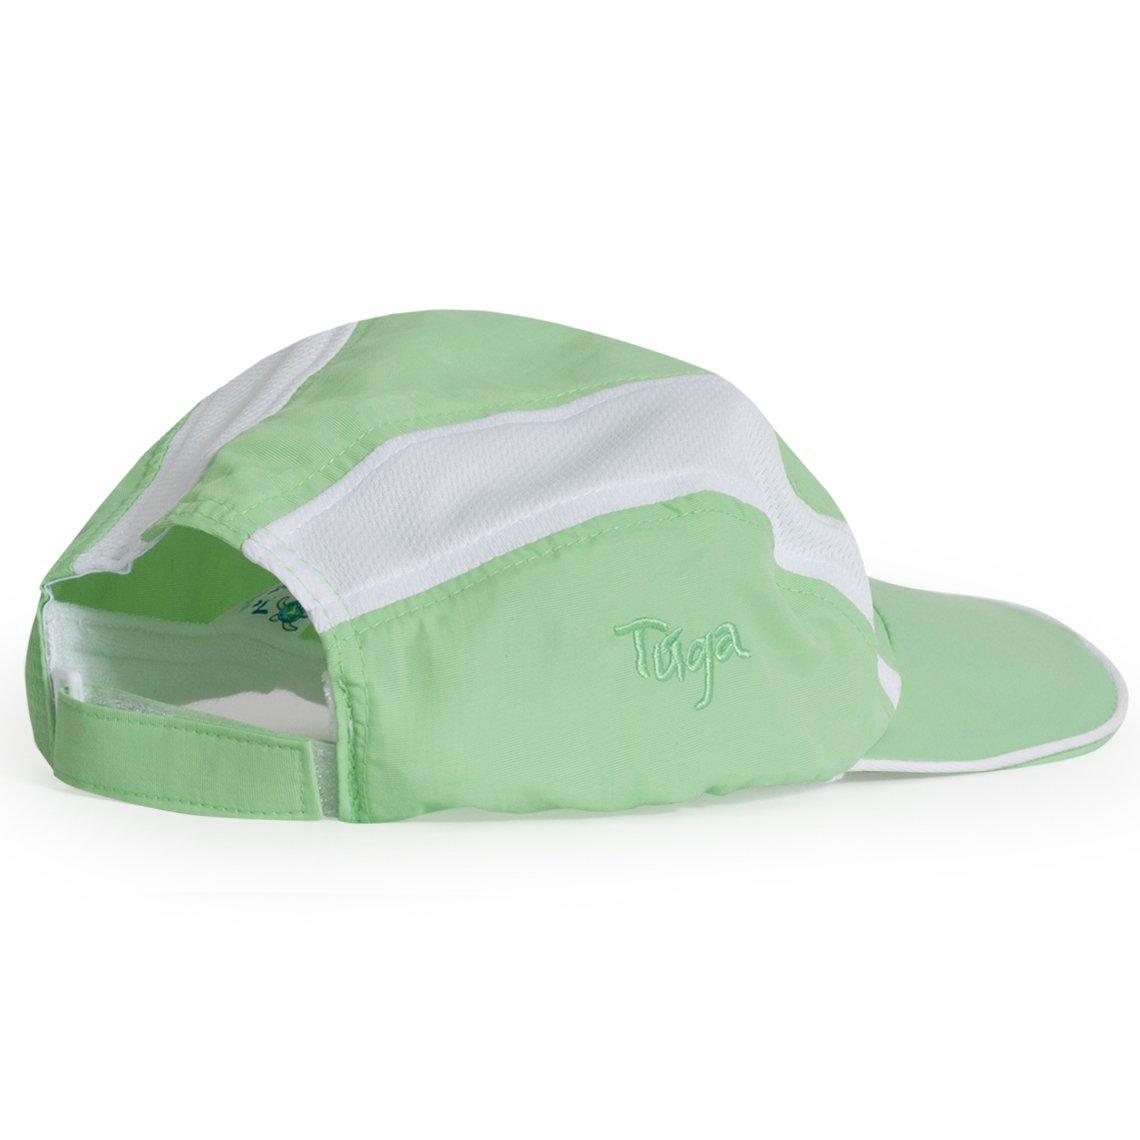 6b271f8bd84 Tuga Adult Unisex Runners Hats (UPF 50+)